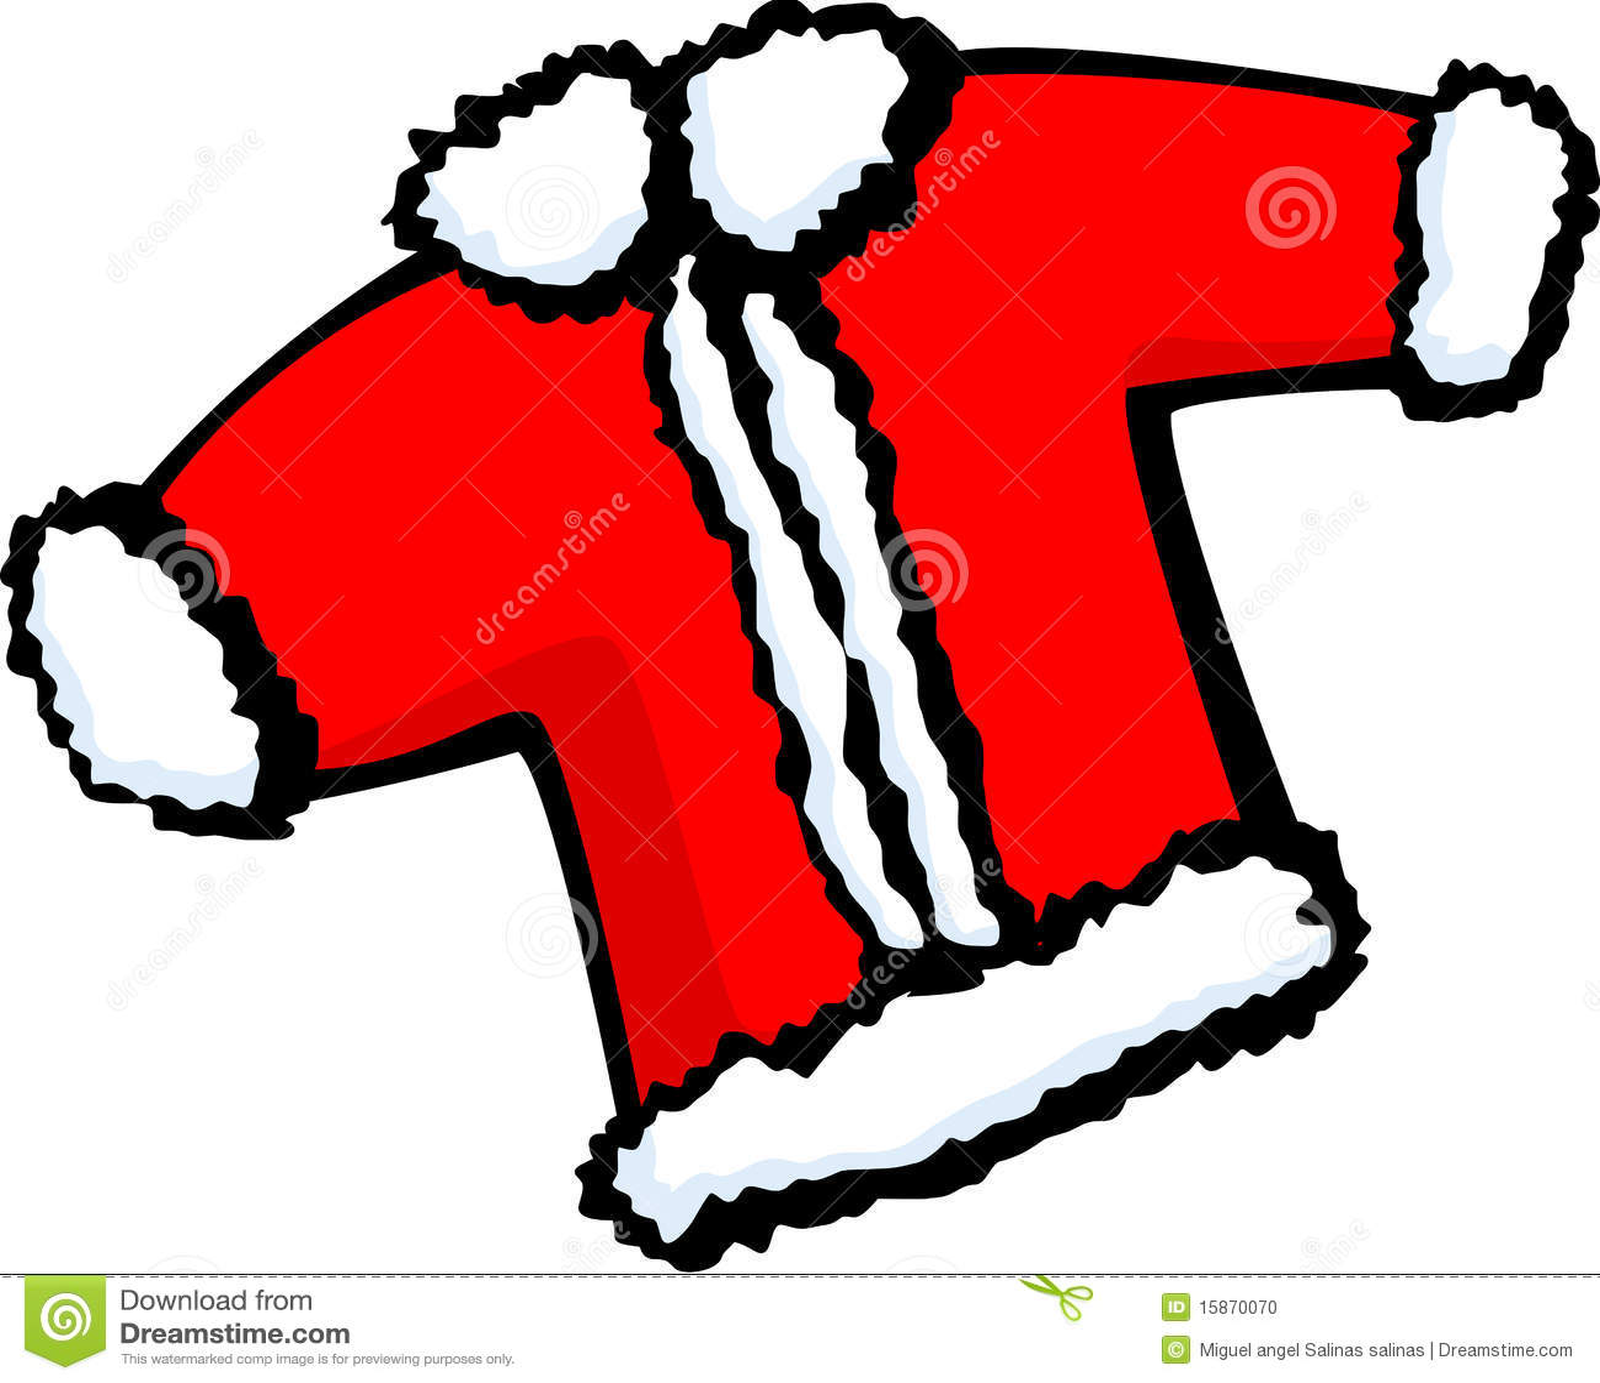 santa claus christmas coat vector illustration - Santa Claus Coat